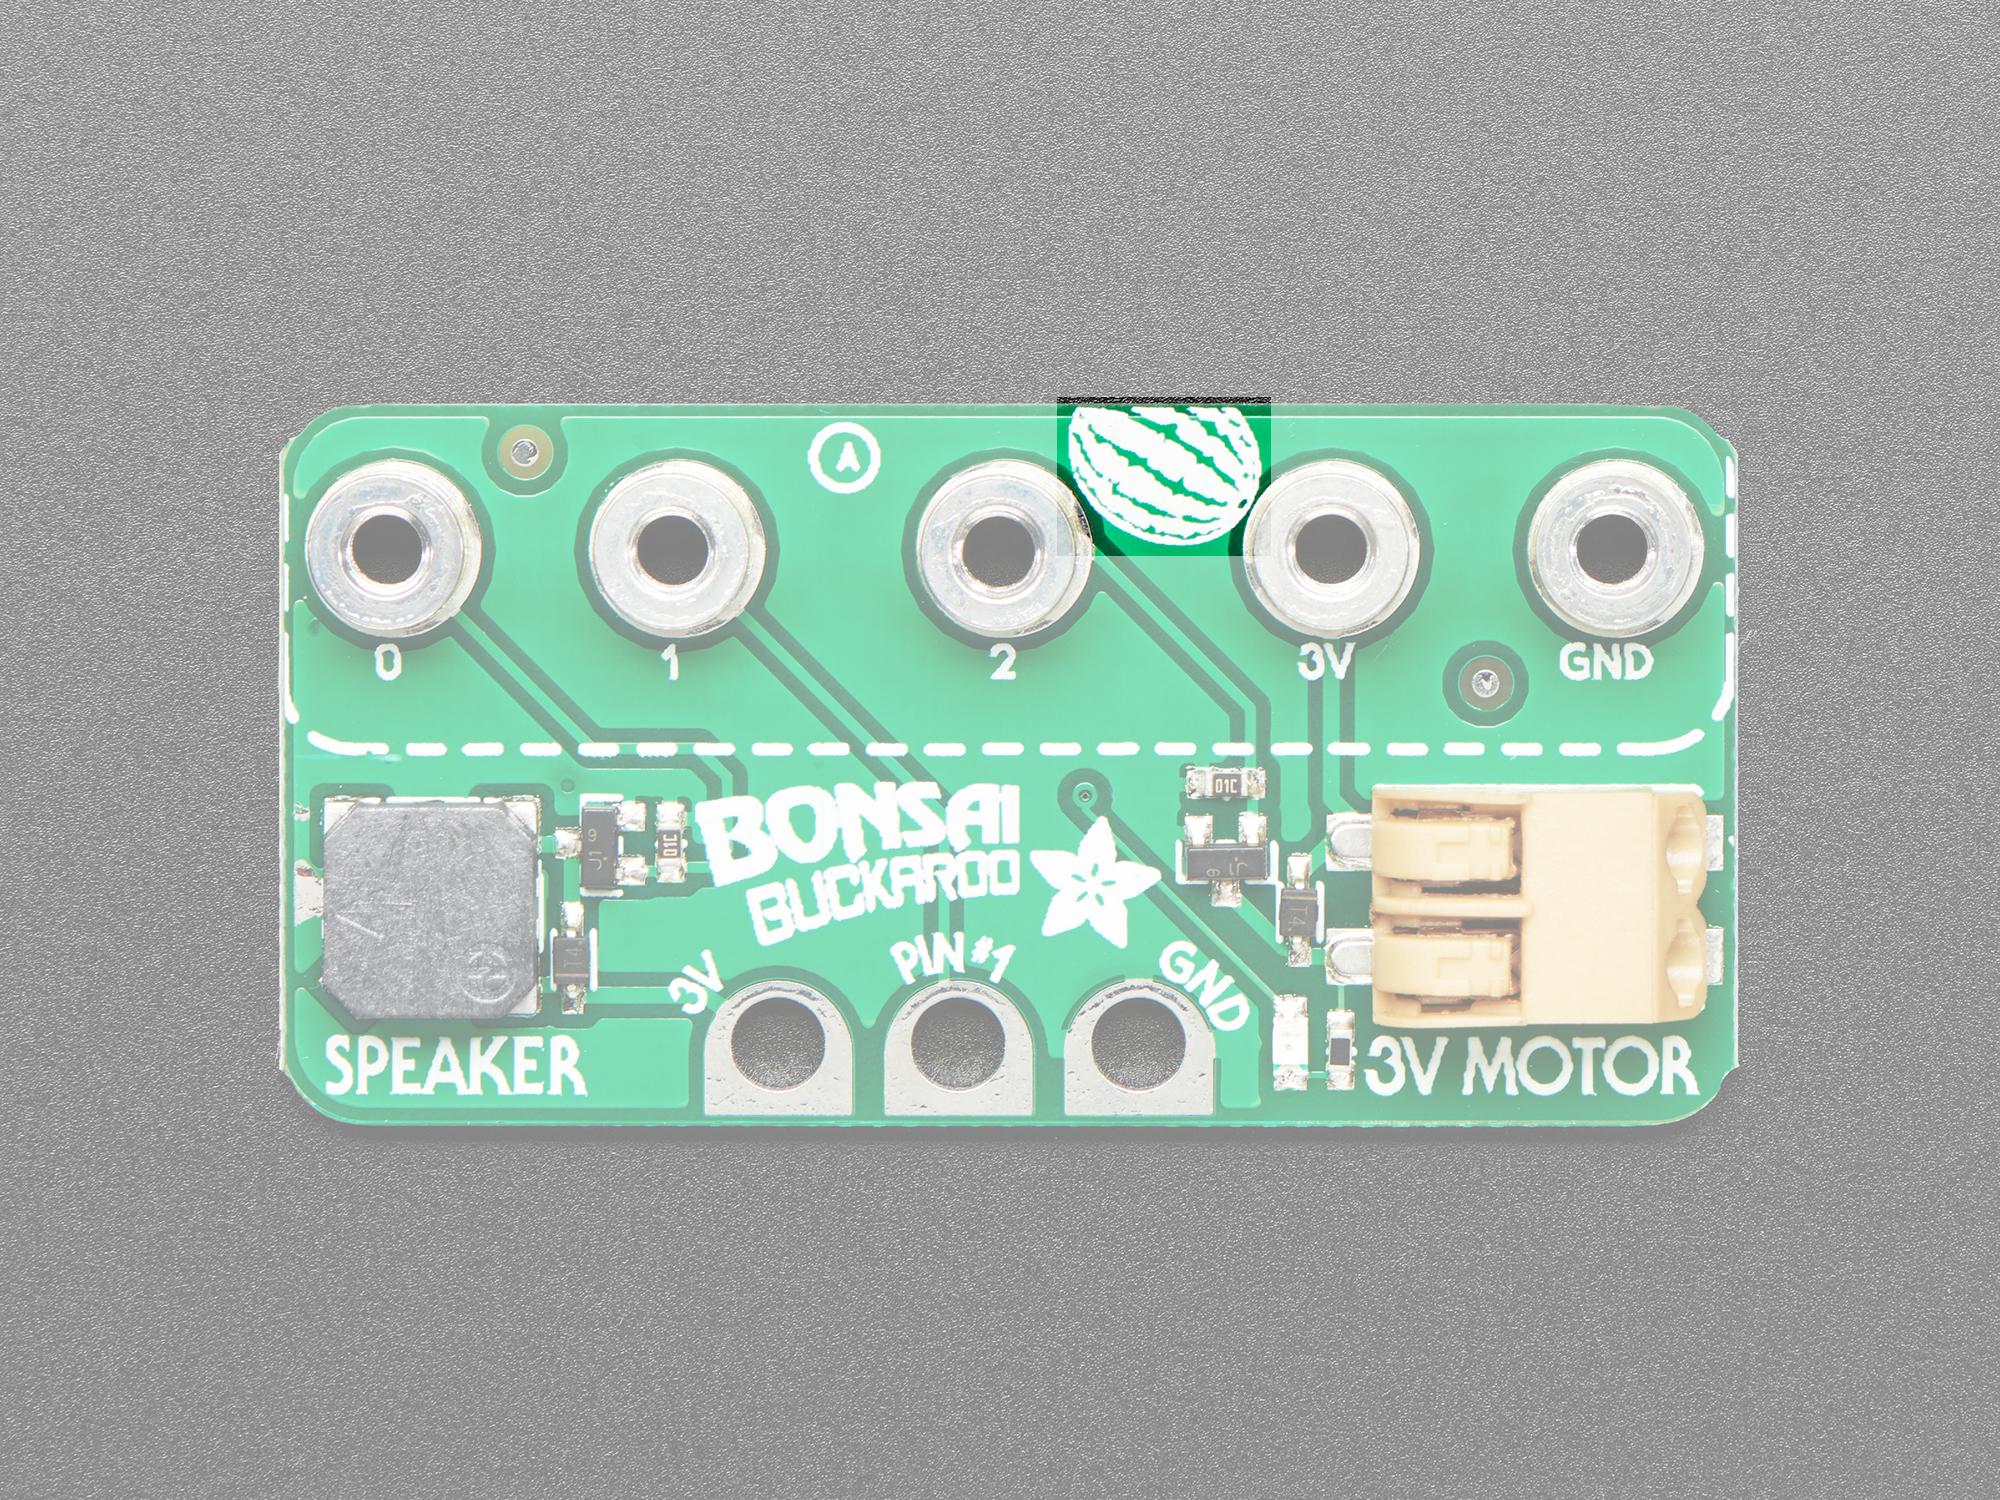 sensors_BB_pinouts_watermelon.jpg